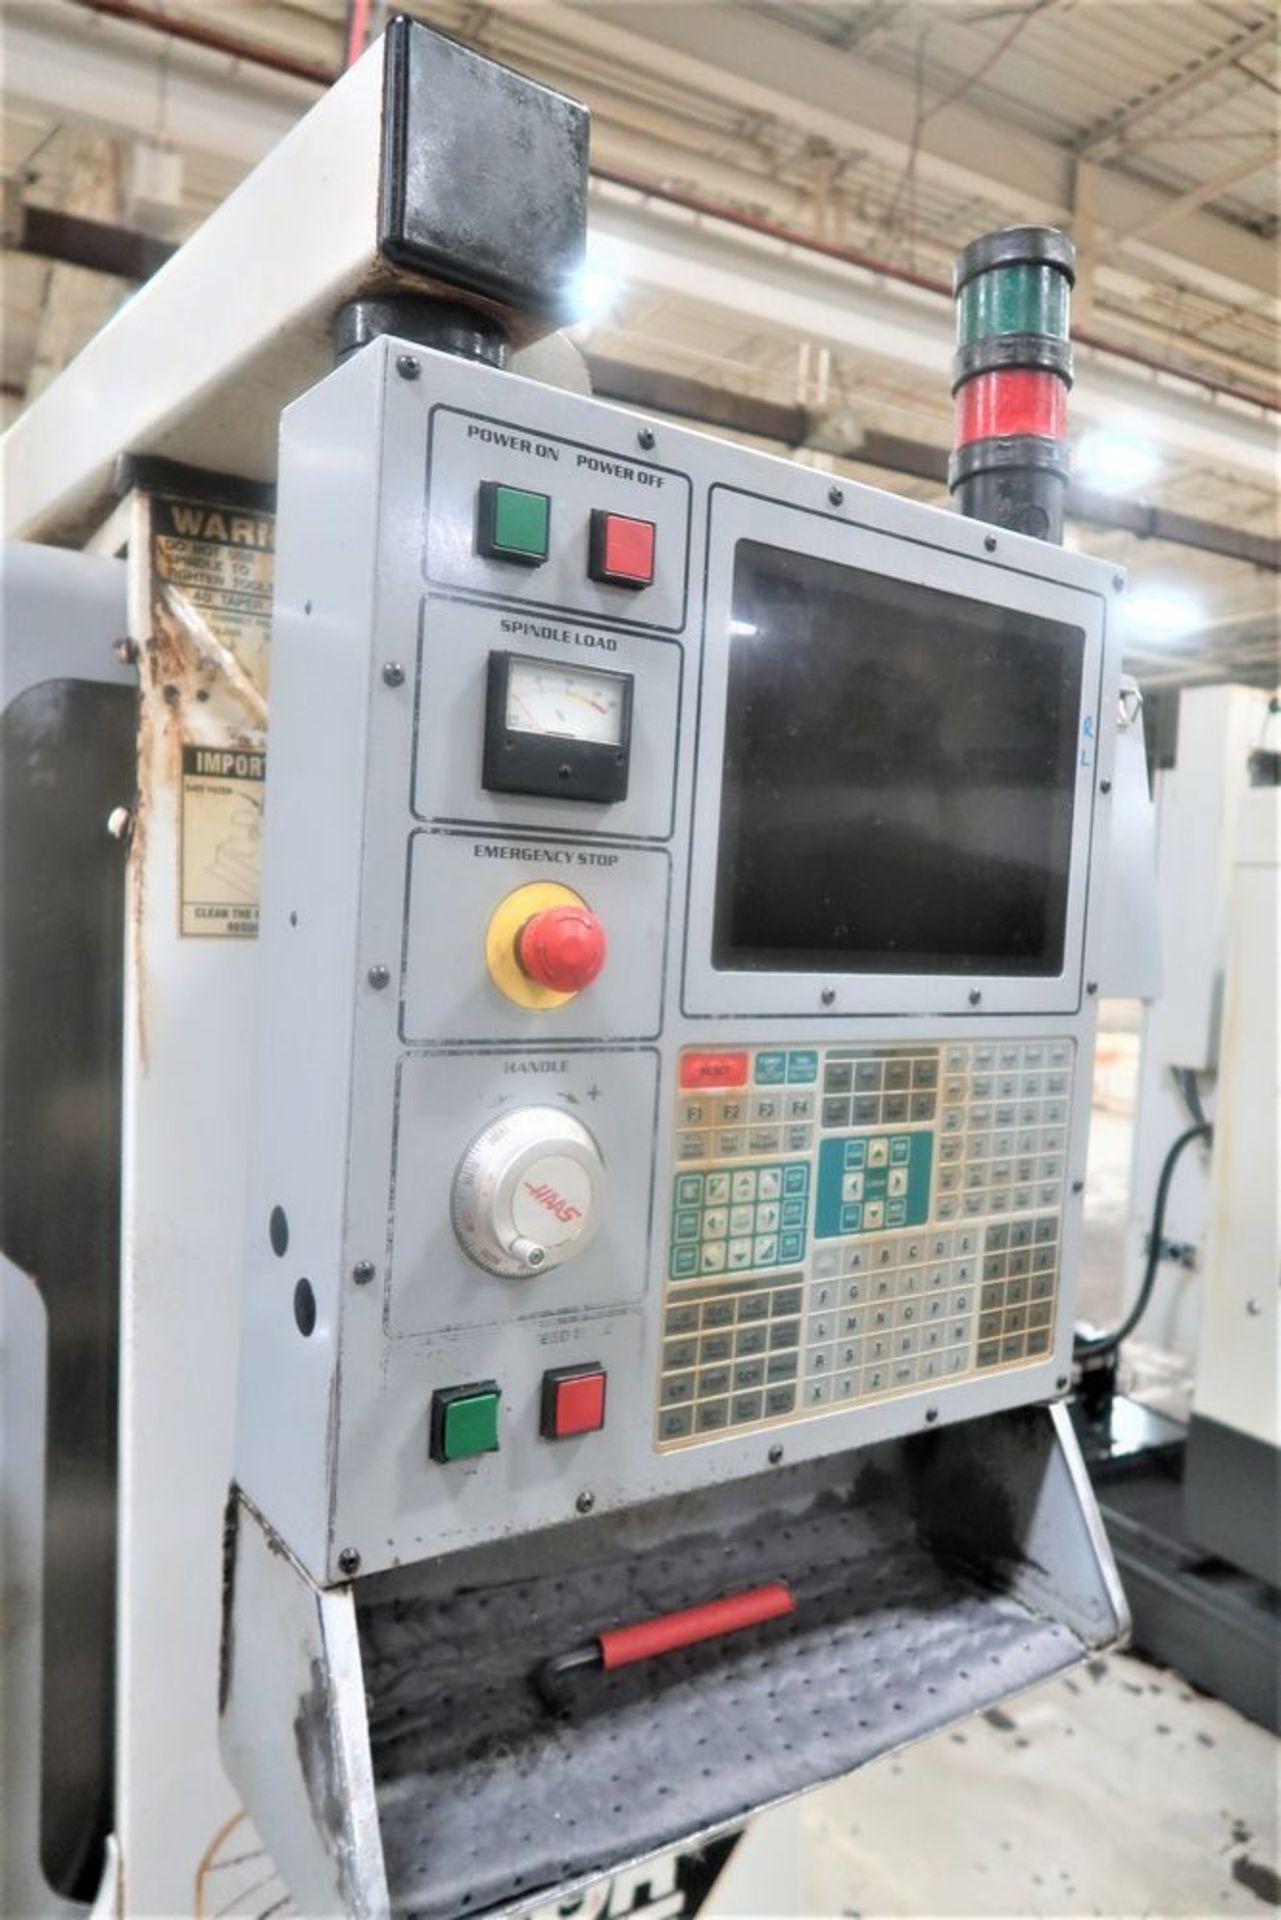 Lot 26 - Haas VF-1 4-Axis CNC Vertical Machining Center, S/N 22957